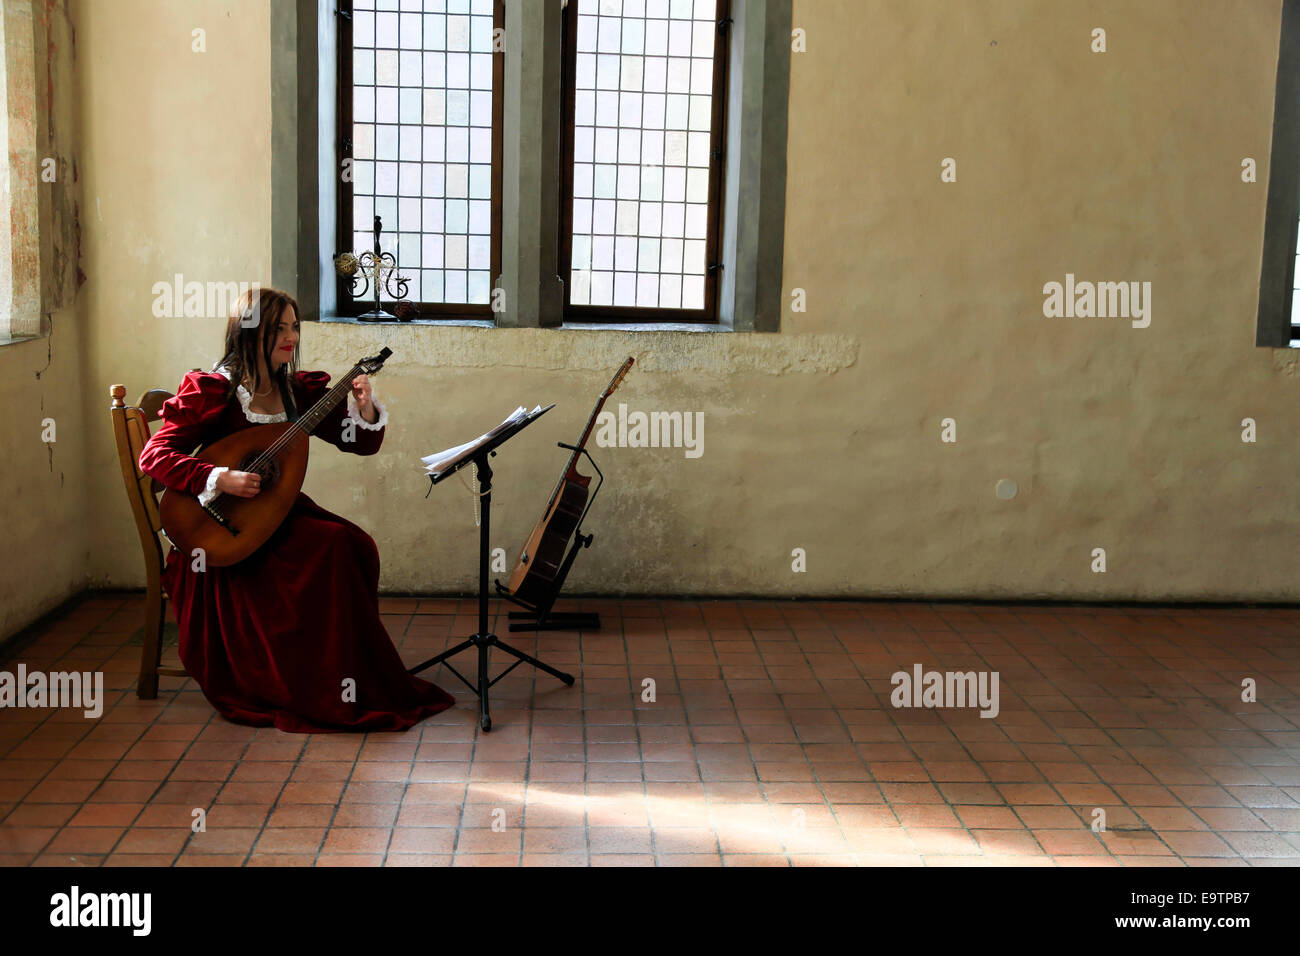 Frau spielt die Laute in Malbork (Marienburg) Schloss Polen Stockbild